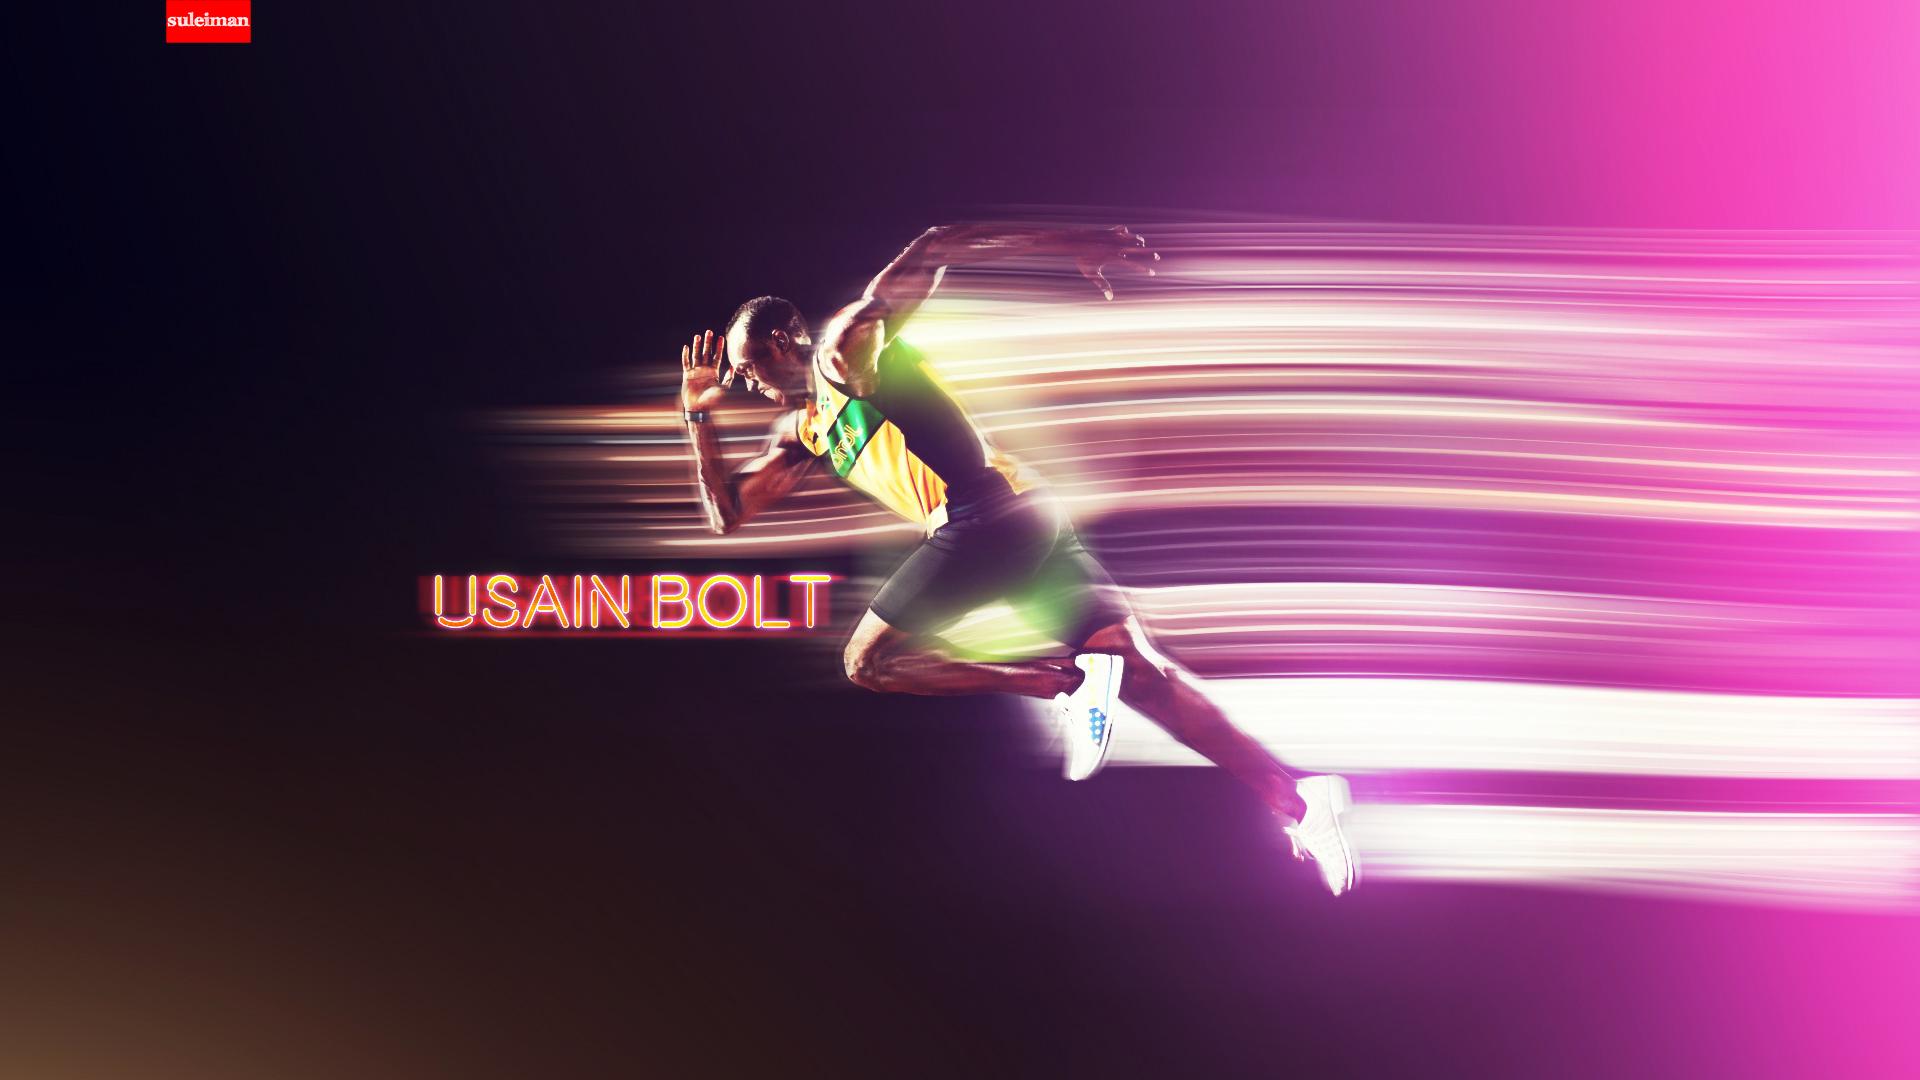 Usain Bolt Running Wallpaper Pixshark Com Images HD Wallpapers Download Free Images Wallpaper [1000image.com]